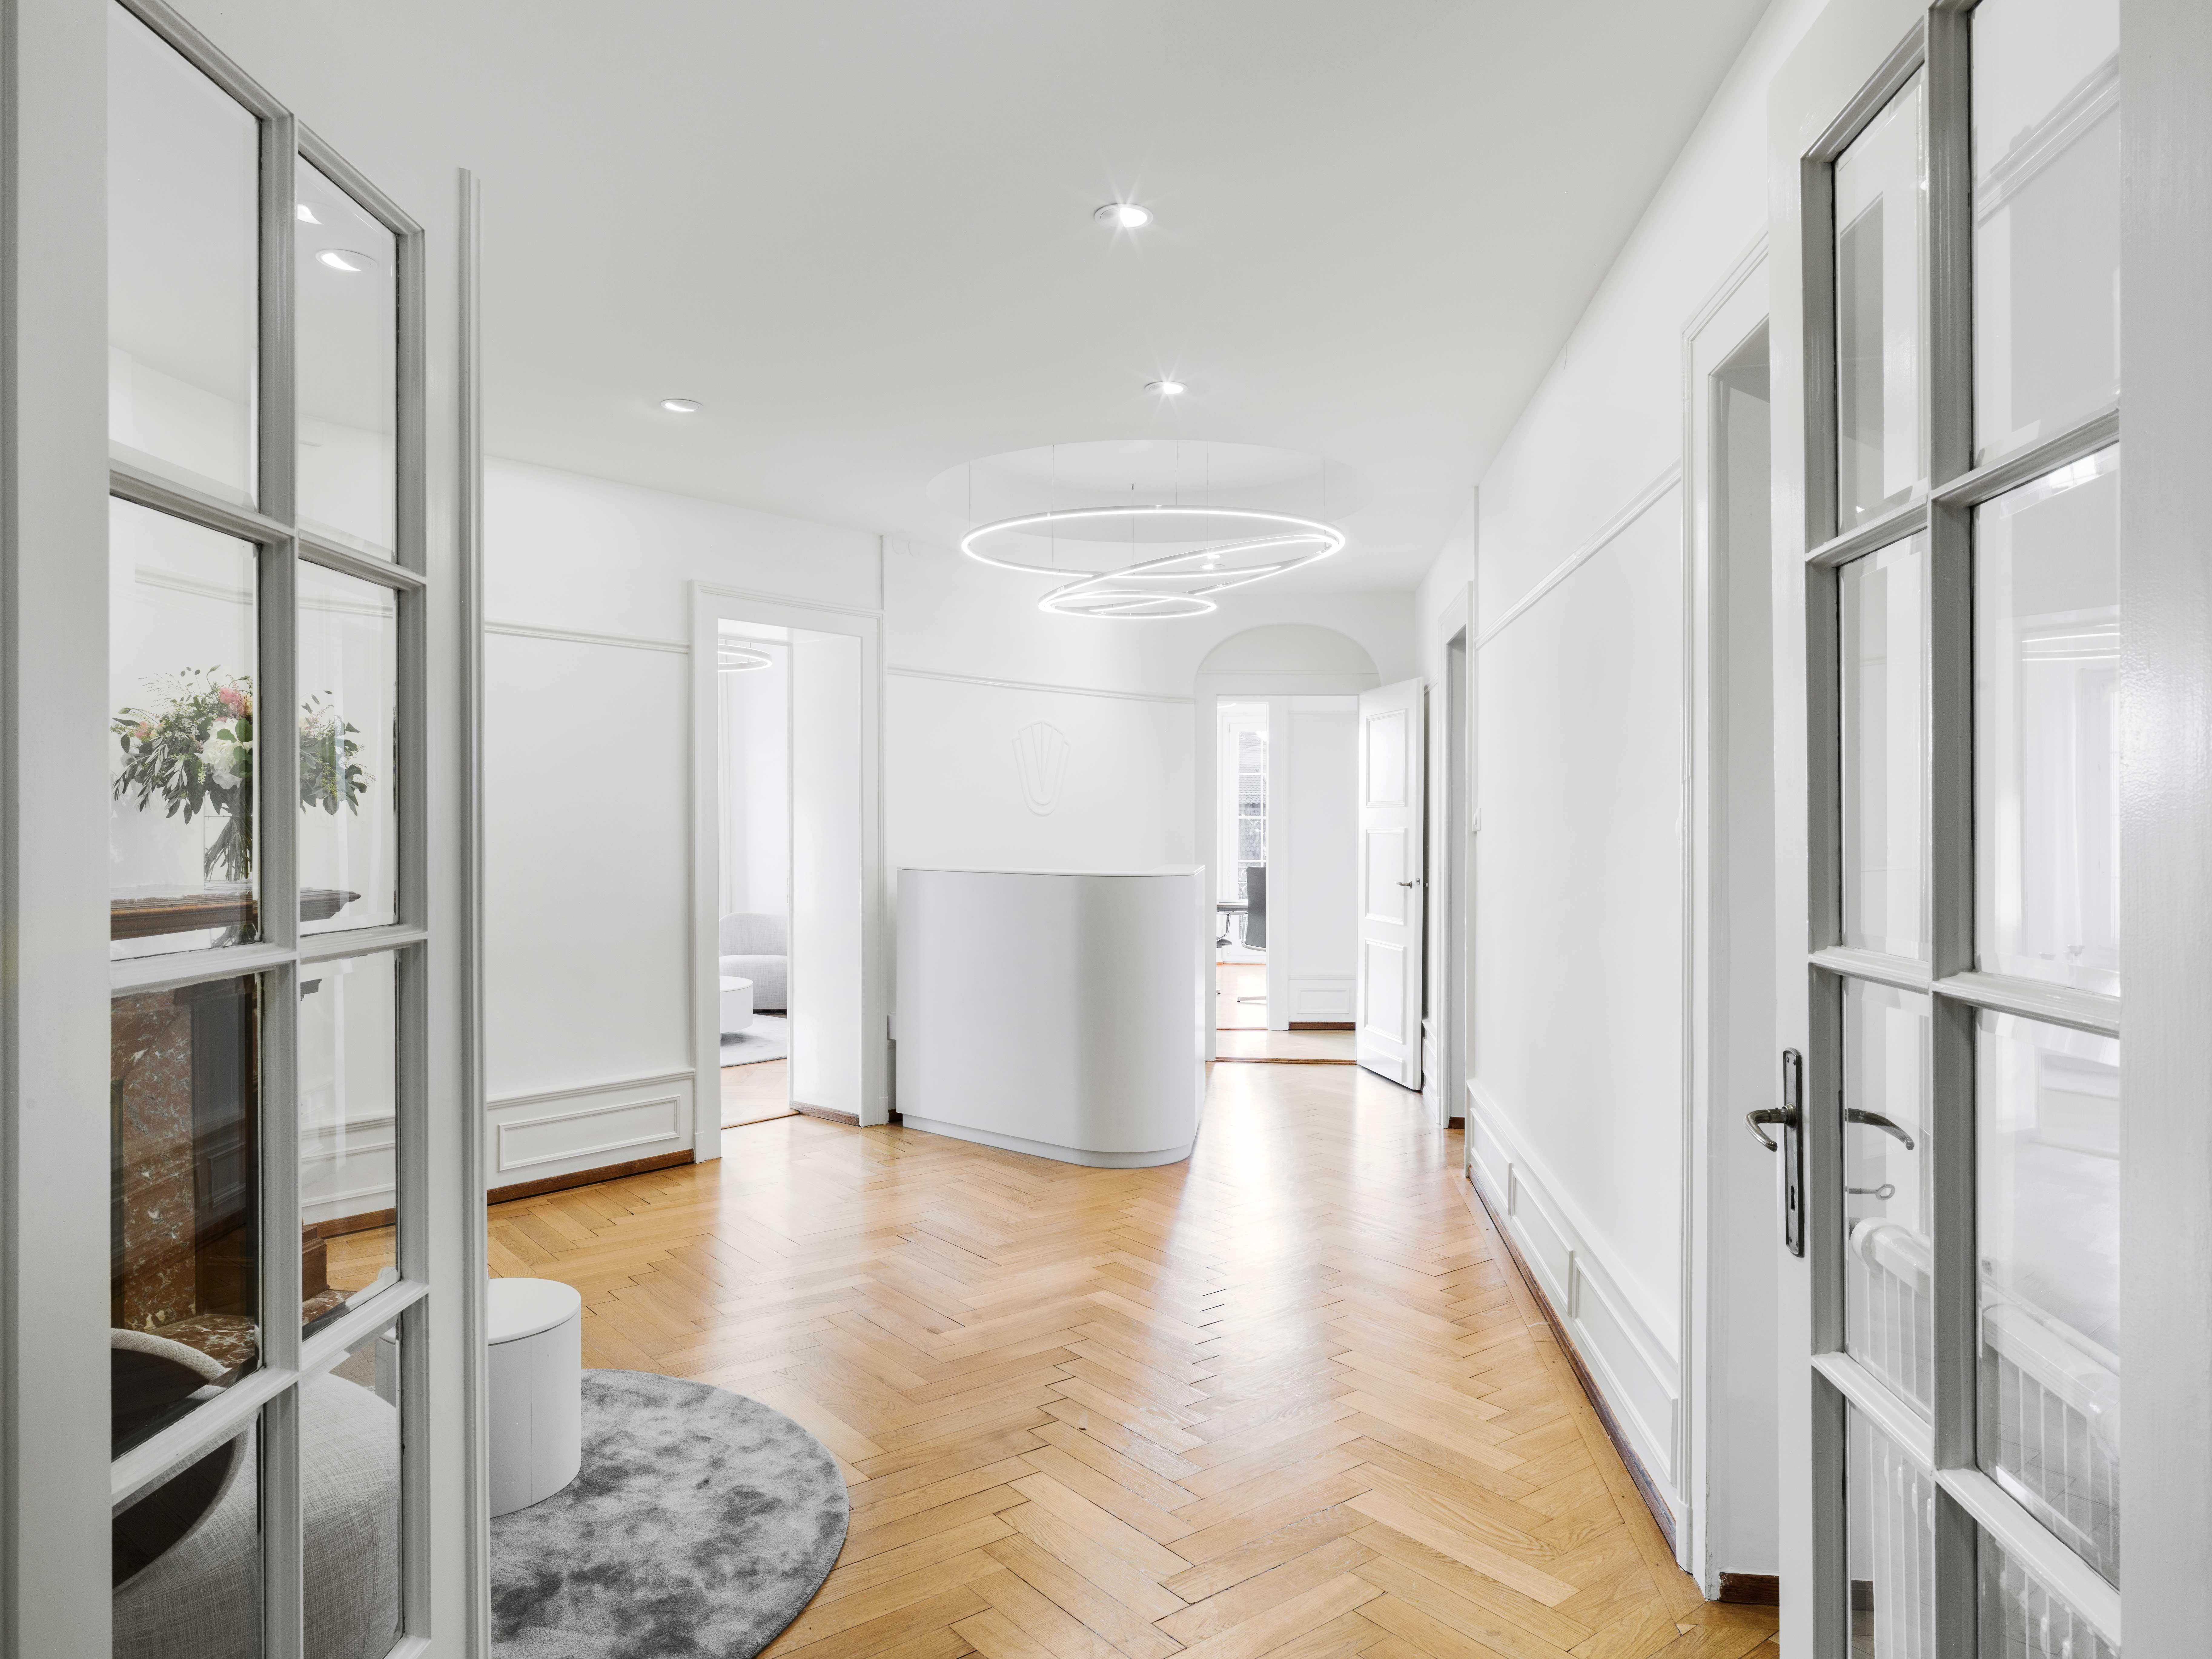 Reconstruction Beauty Clinic Interior Design Wooden Floor